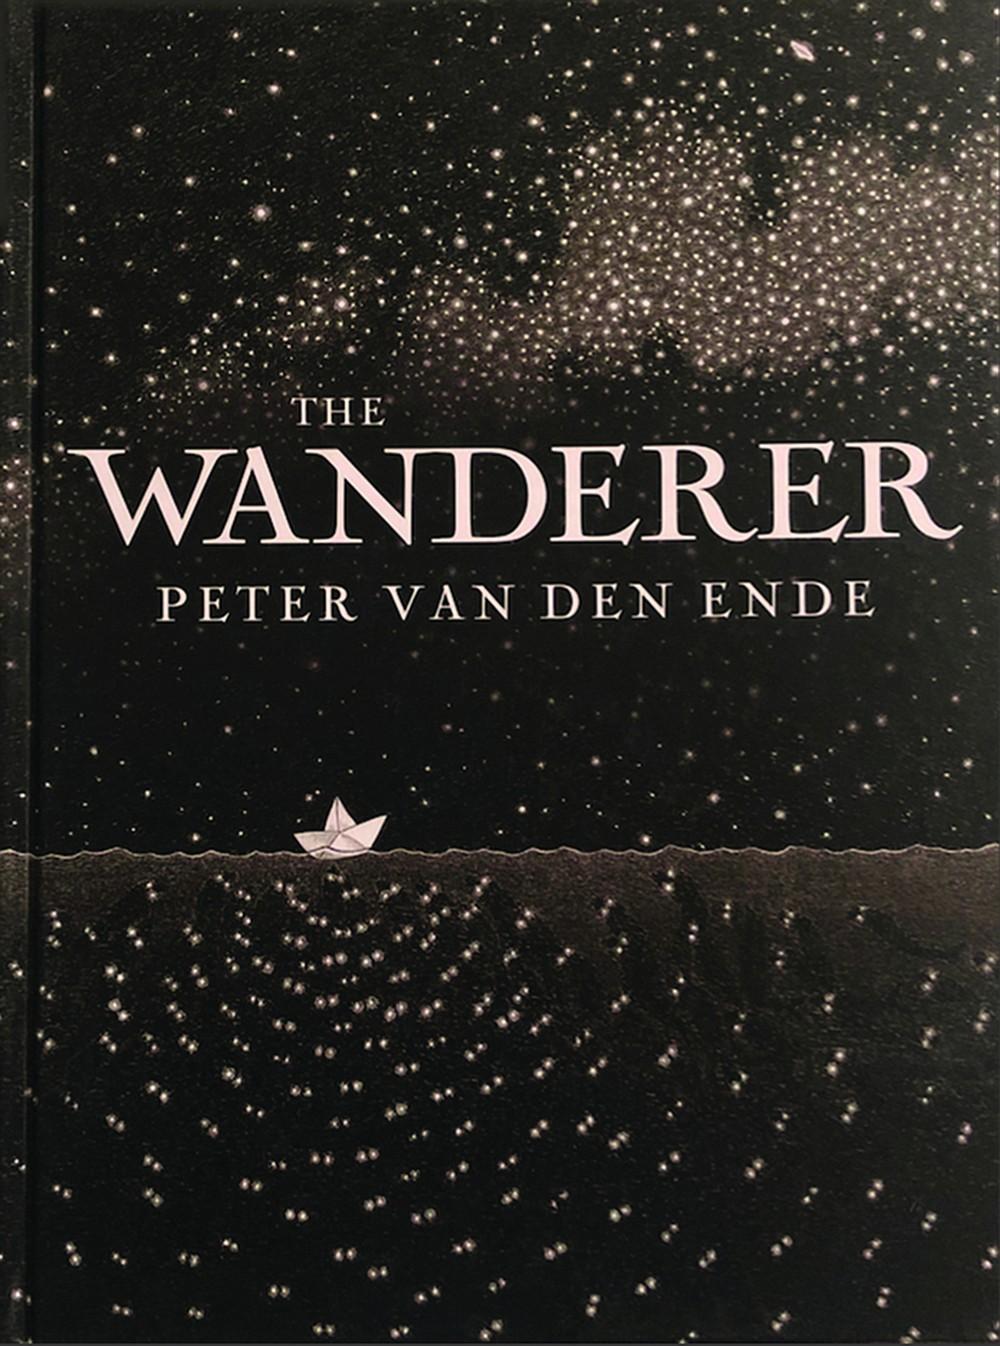 """The Wanderer"" by Peter Van den Ende (Levine Querido, Oct. 6) ages 8-18, 96 pages, $21.99 hardback, $10.99 ebook. (Arkansas Democrat-Gazette/Celia Storey)"